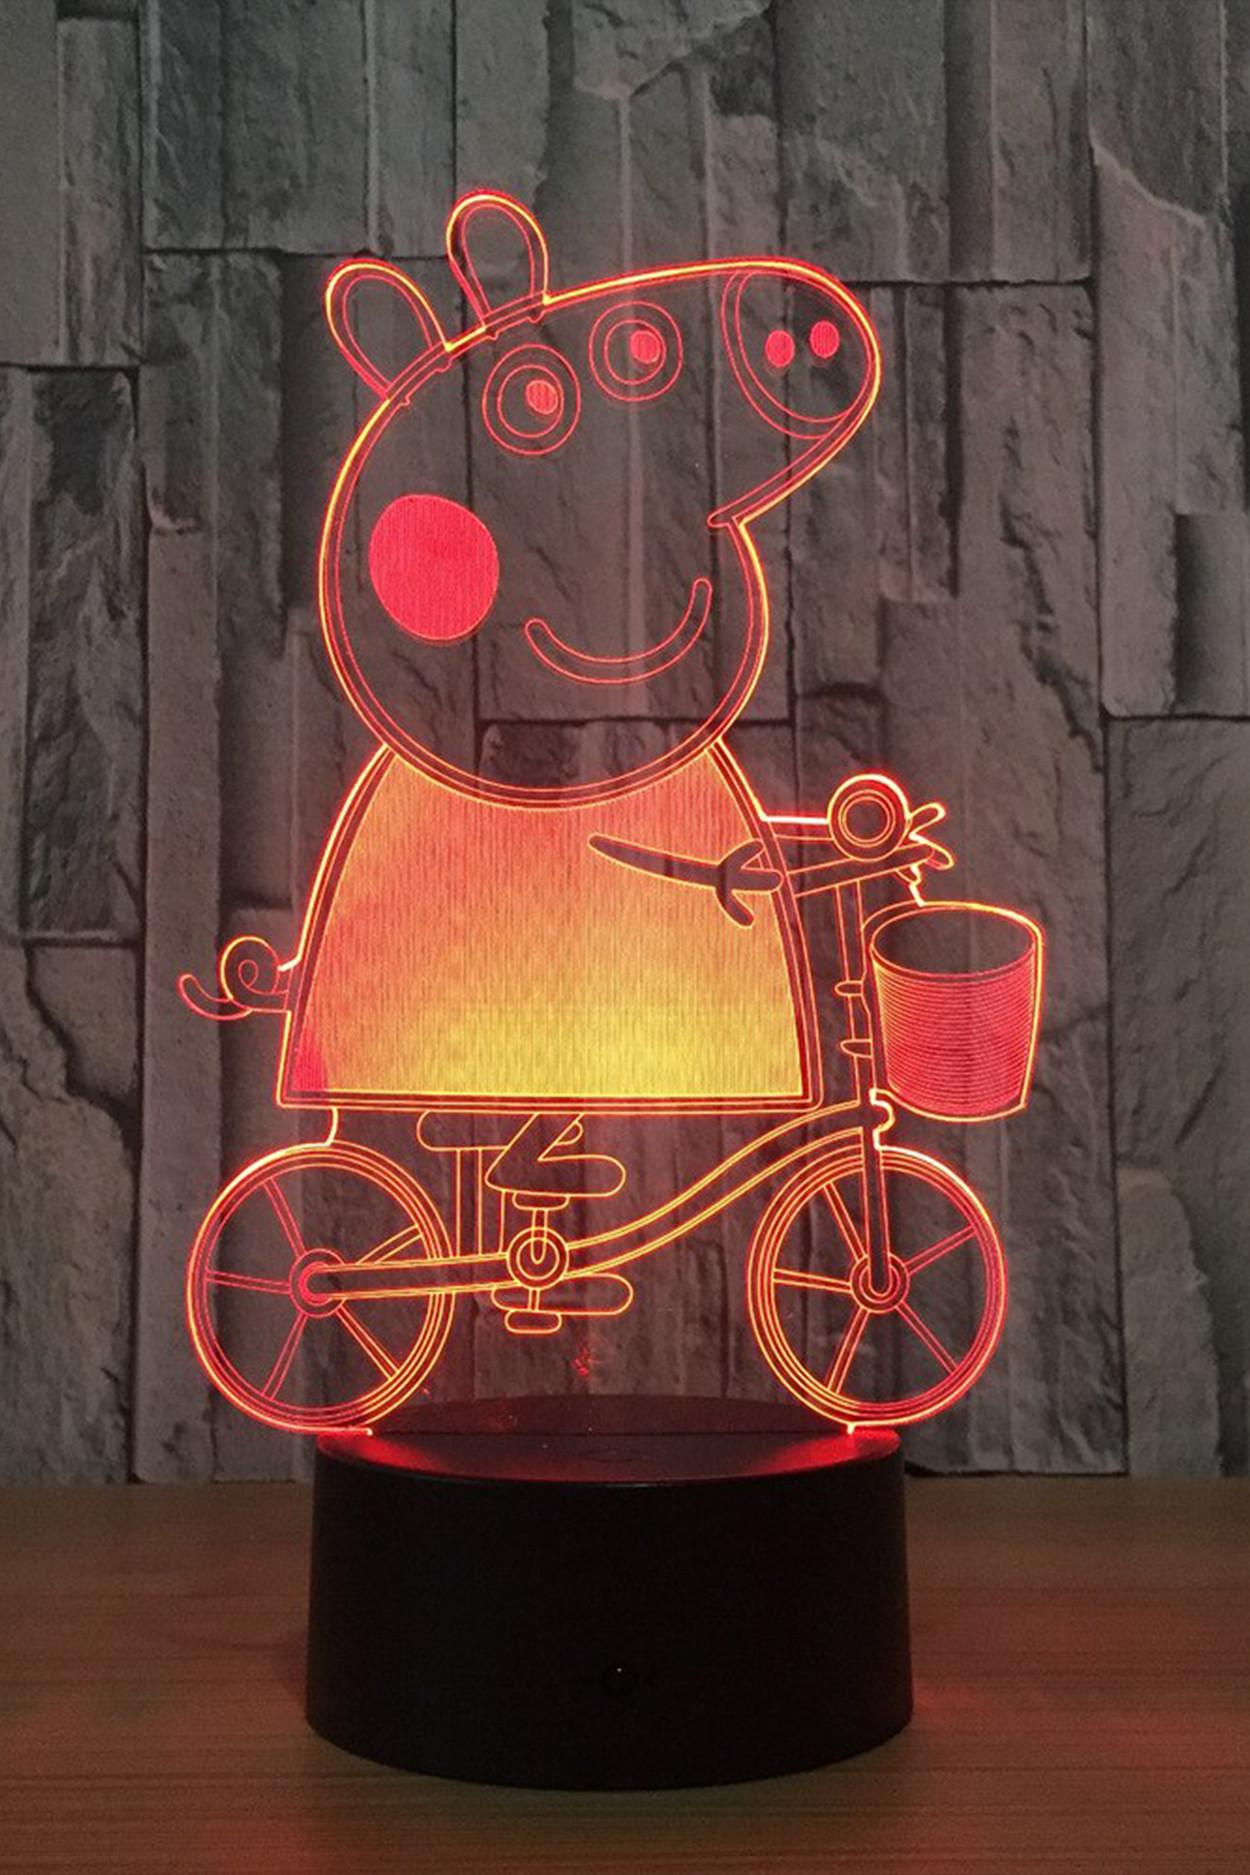 3D ночник Свинка ПЕППА на велосипеде 7 цветов